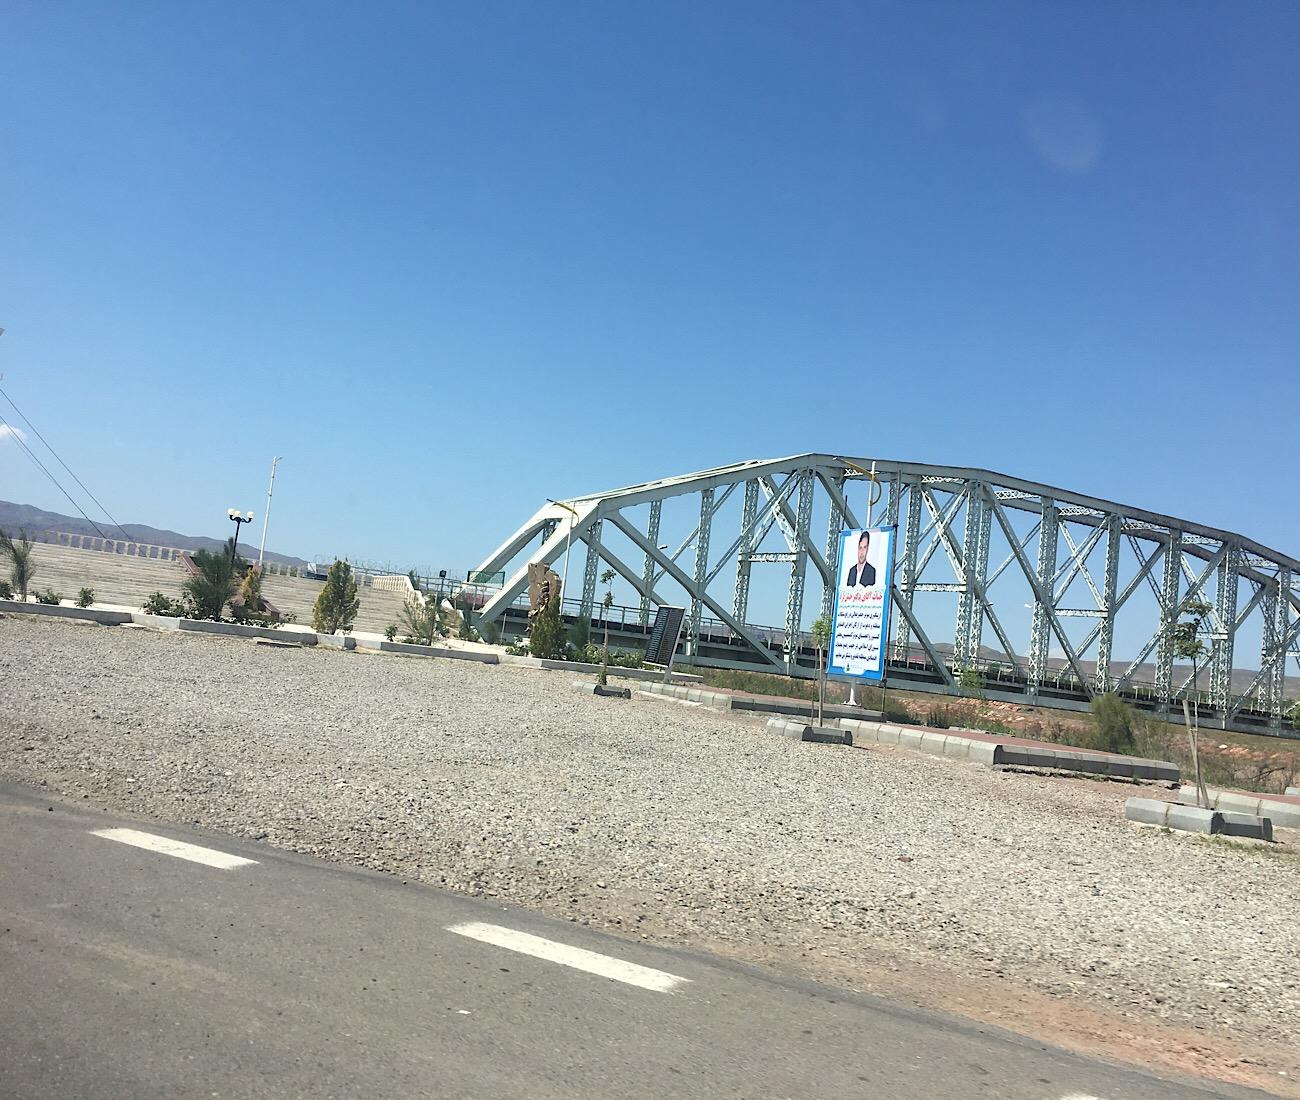 Gruzja-Armenia-Iran-Stambuł. Dzień 6: Nie jedna granica Iranu 1